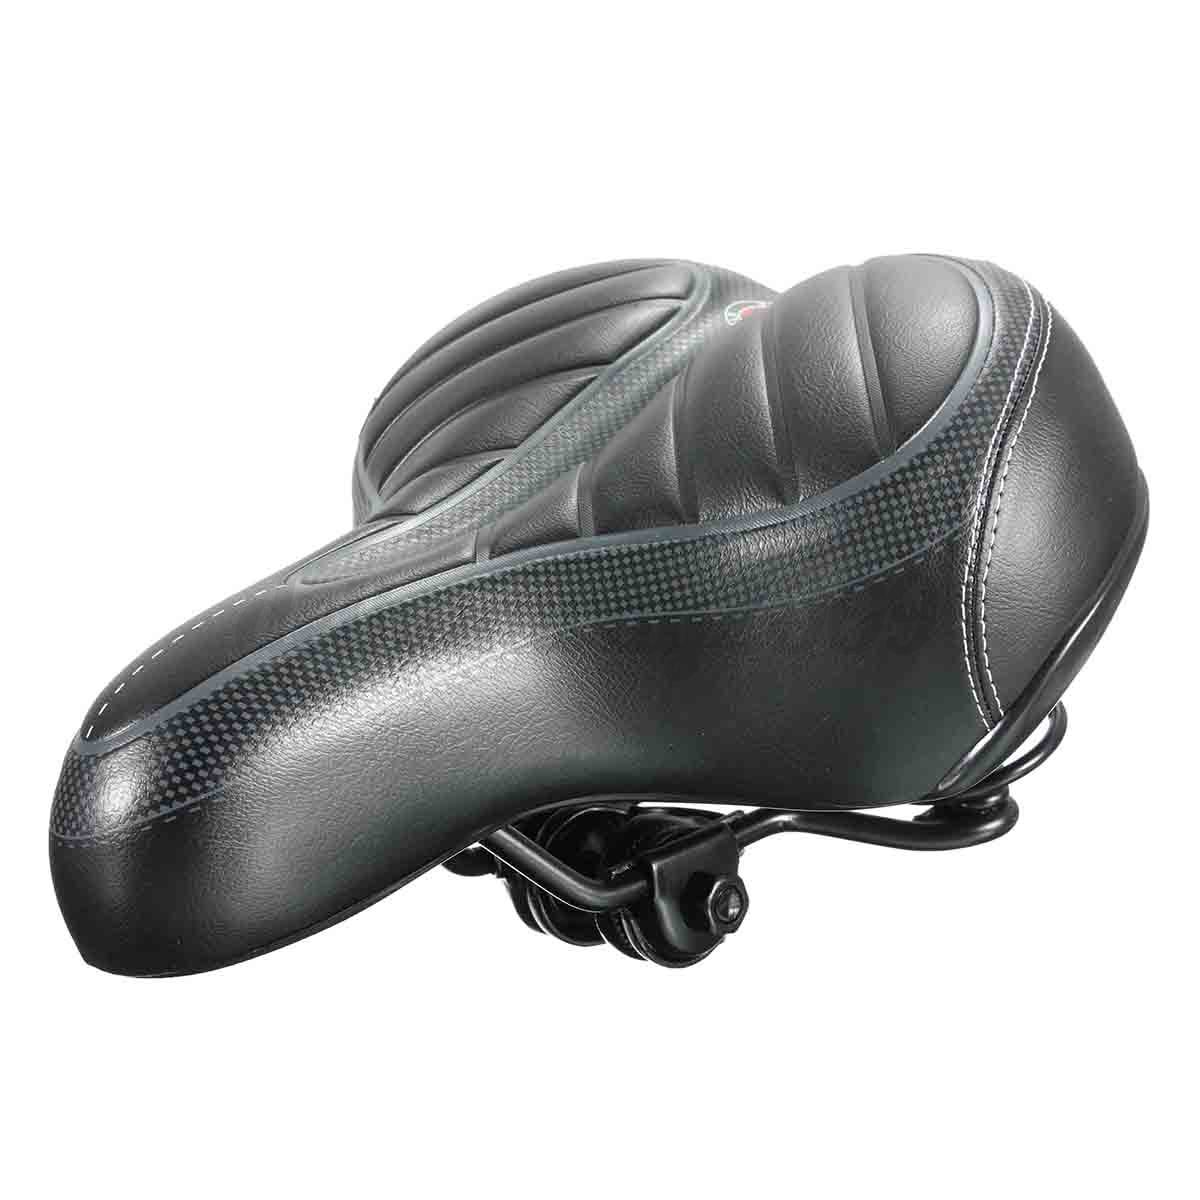 Extra Bike Seat : Extra wide big bum bike bicycle gel cruiser comfort sports